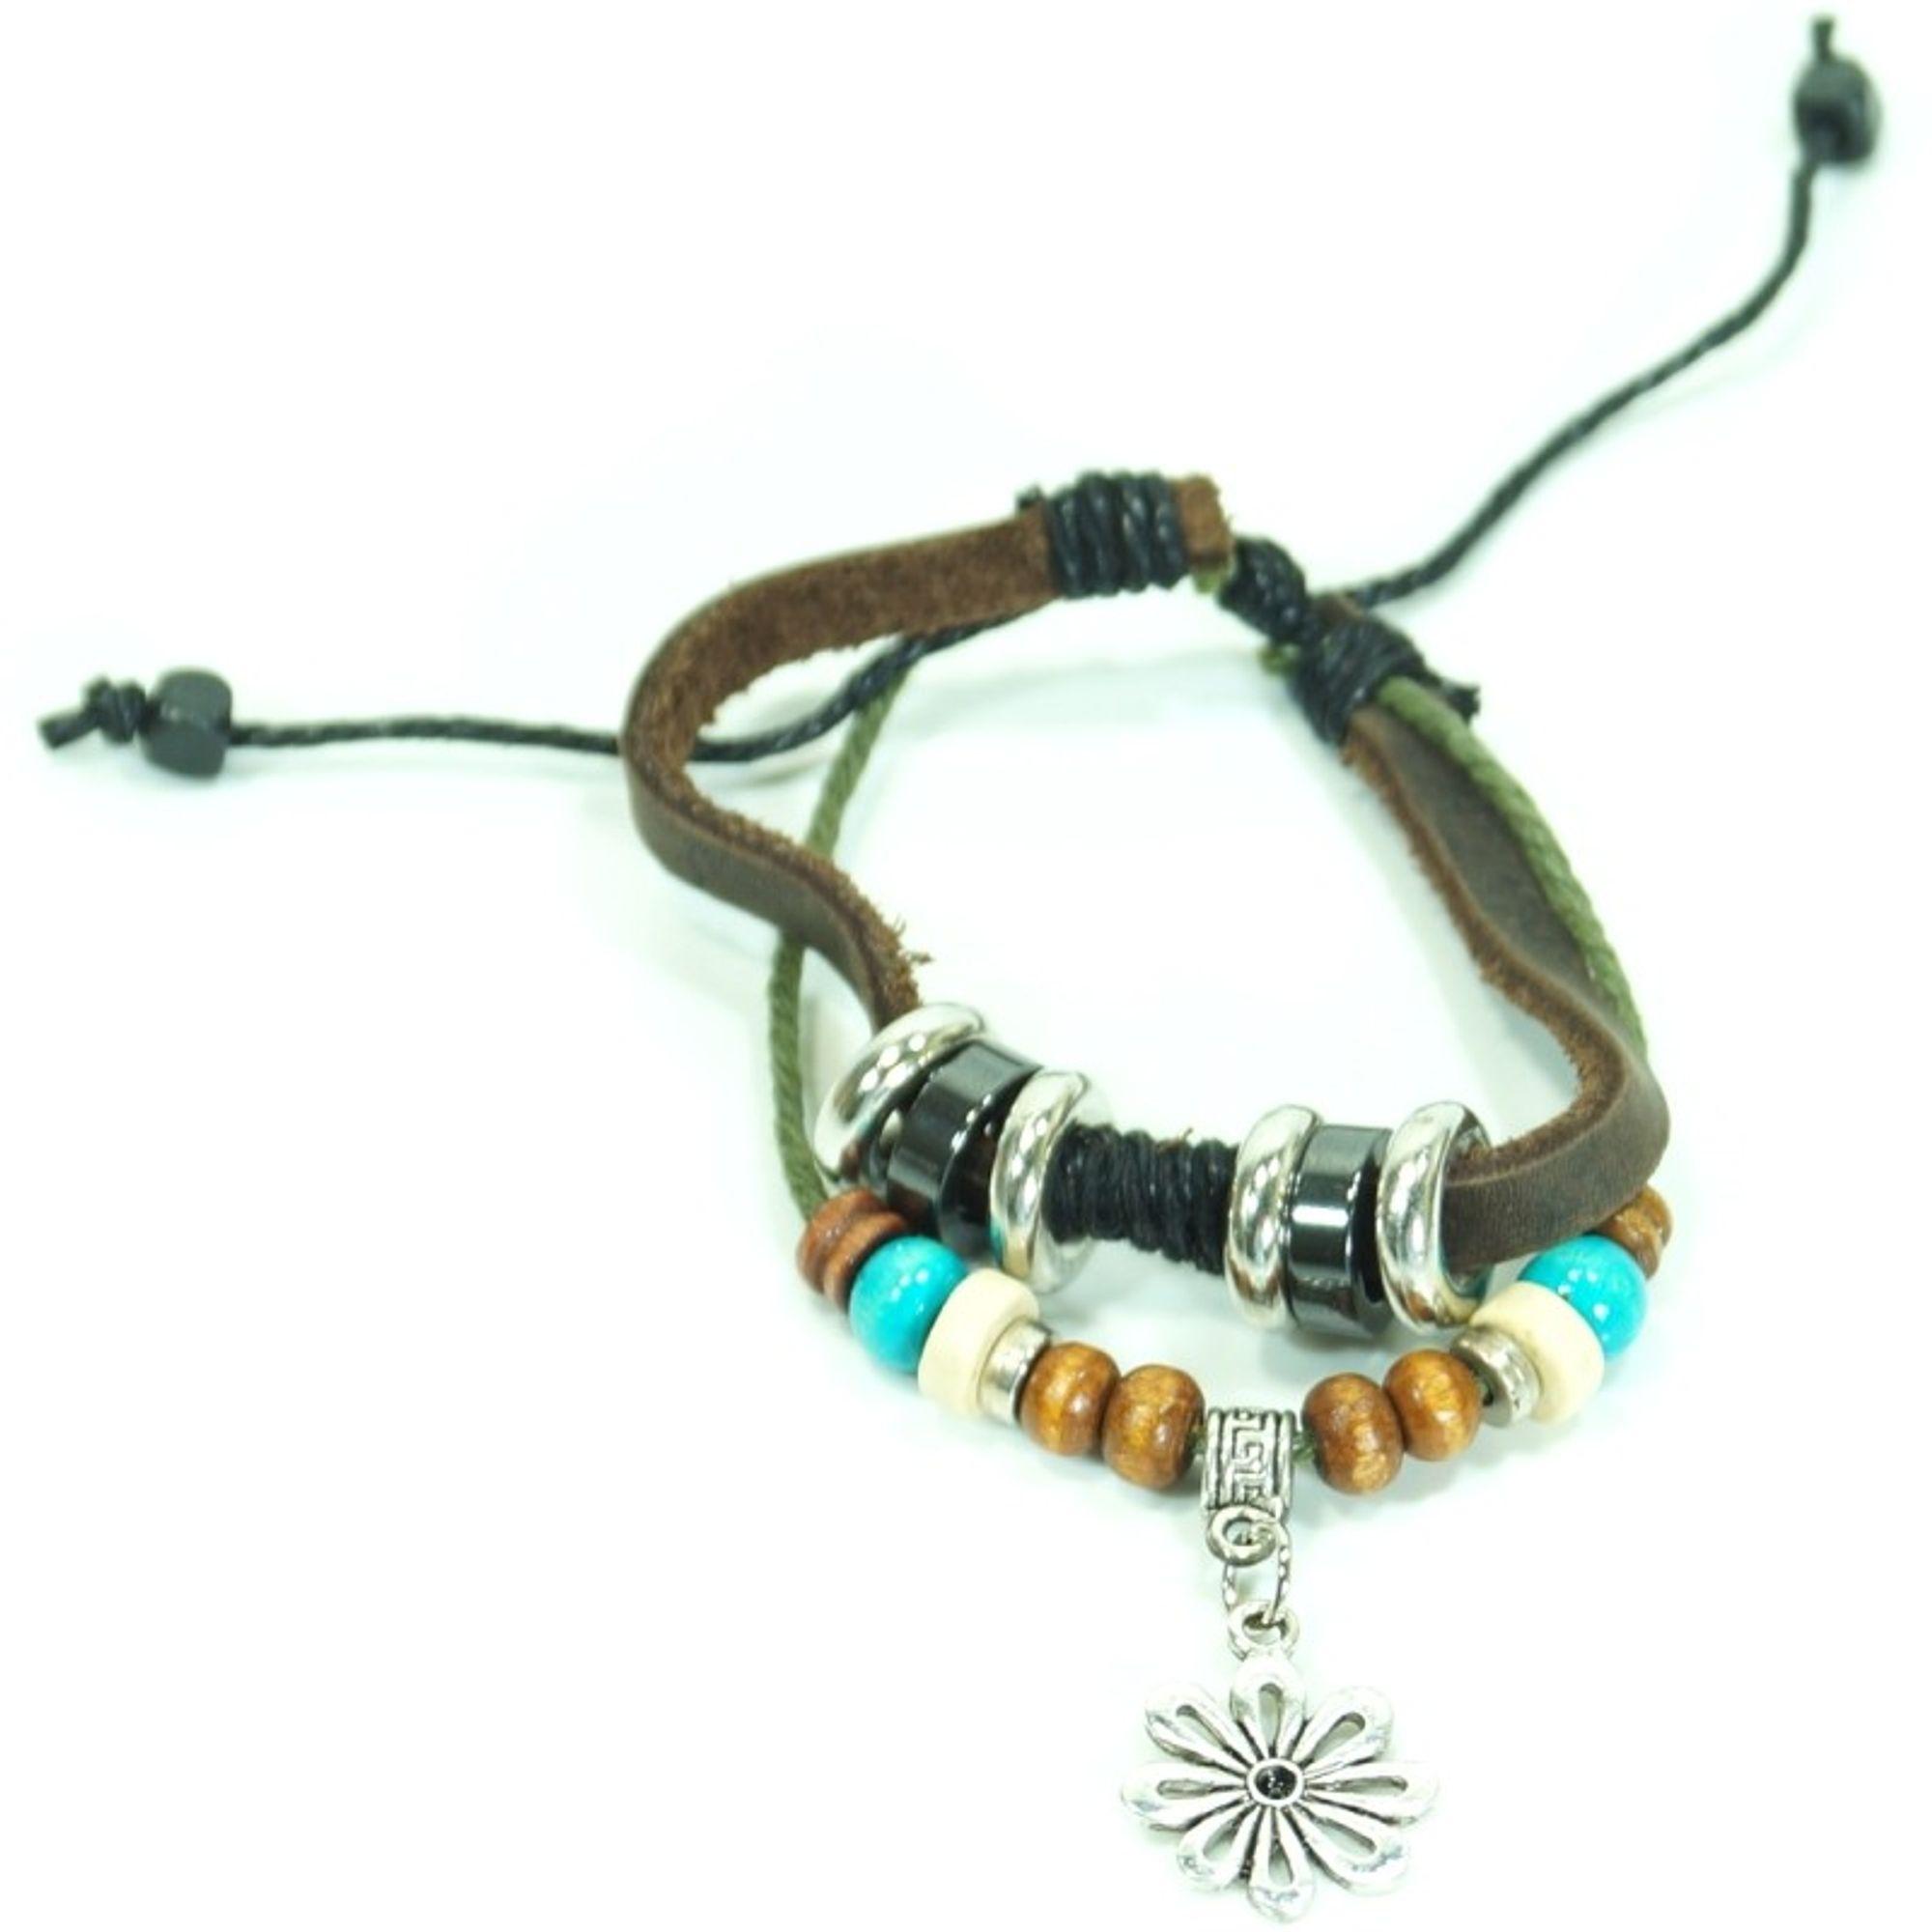 CJBB6149 Damen Armband Blume Leder braun